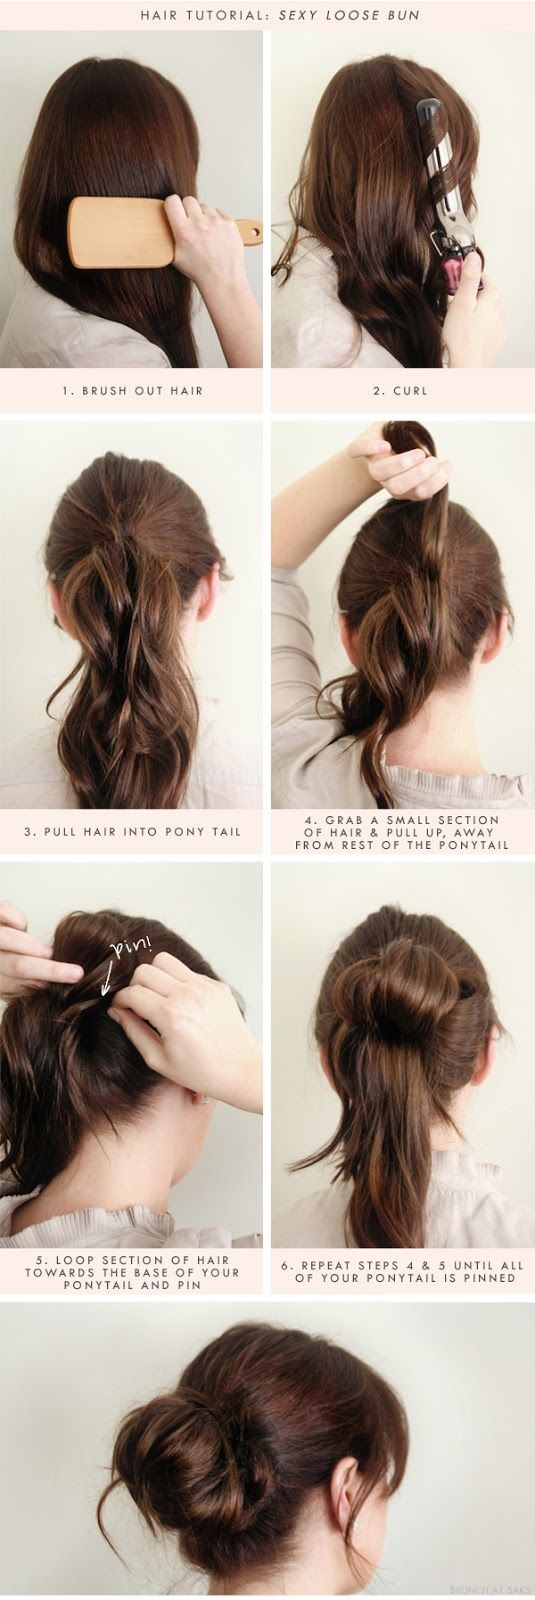 Swell 1000 Ideas About Simple Bun On Pinterest Bun Updo Bun Short Hairstyles For Black Women Fulllsitofus